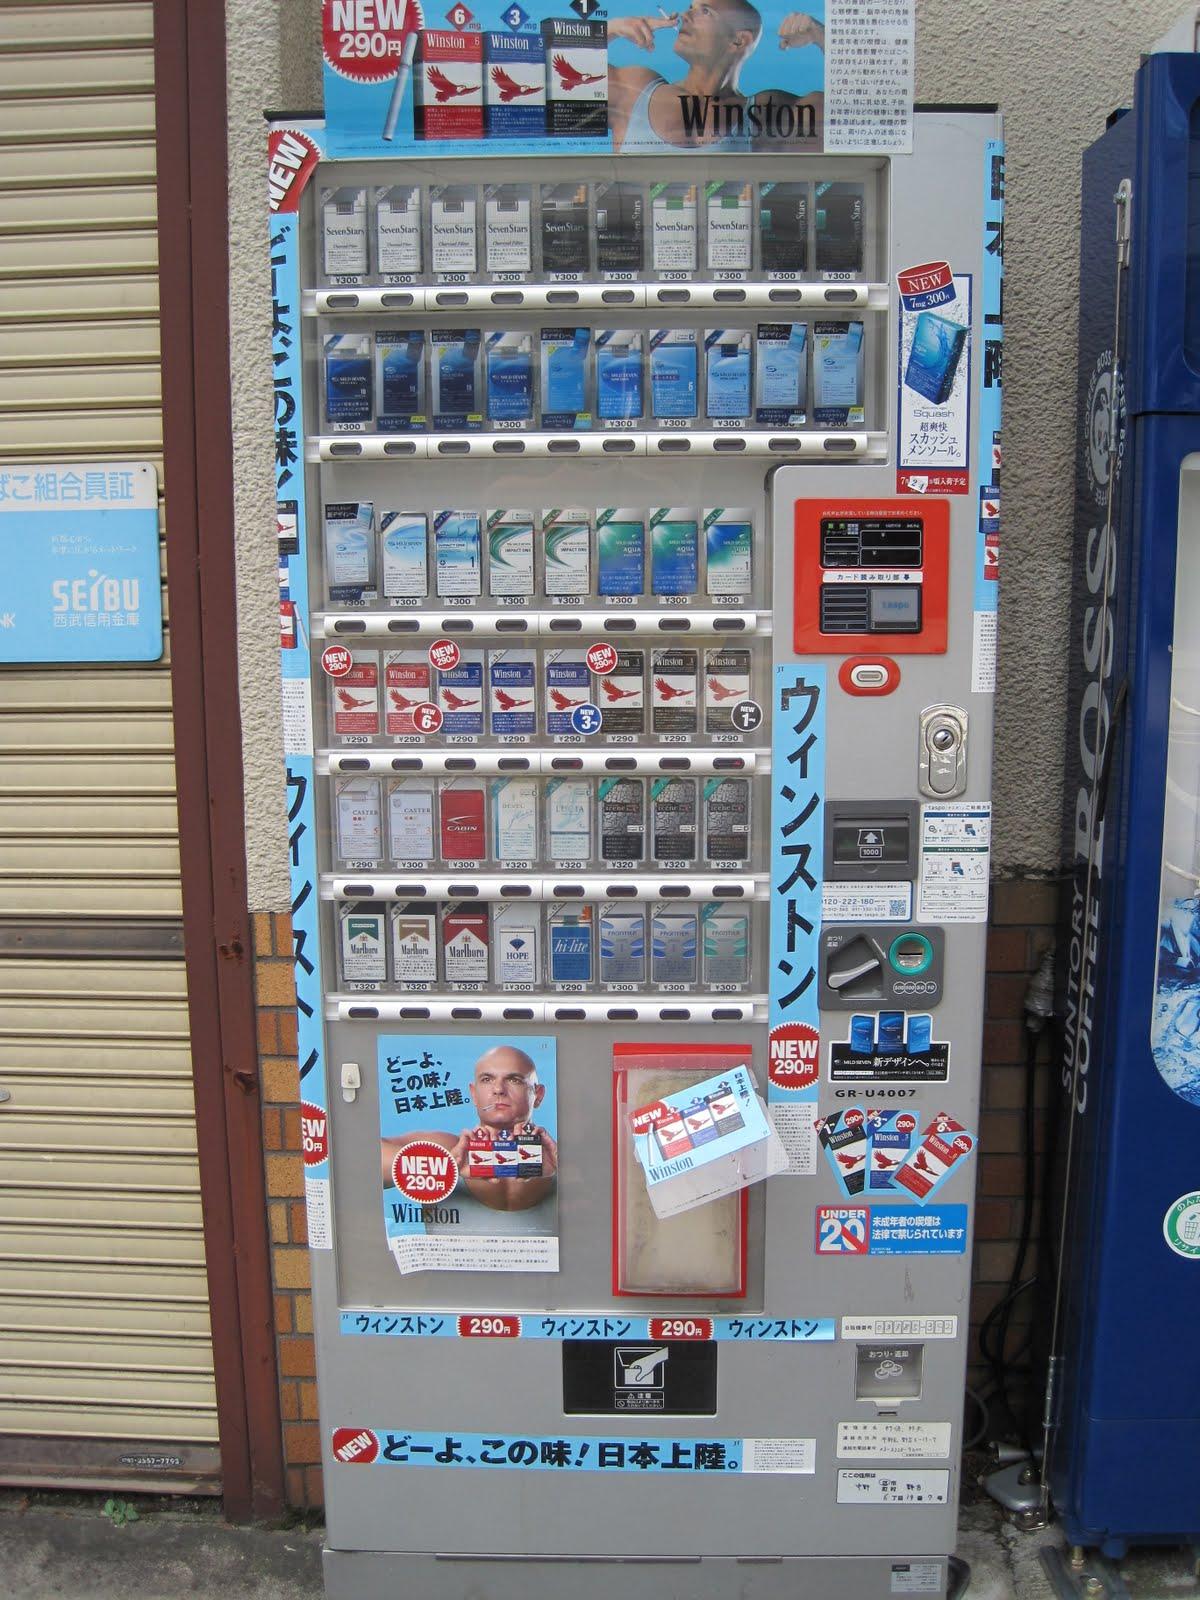 zigaretten am automaten kaufen